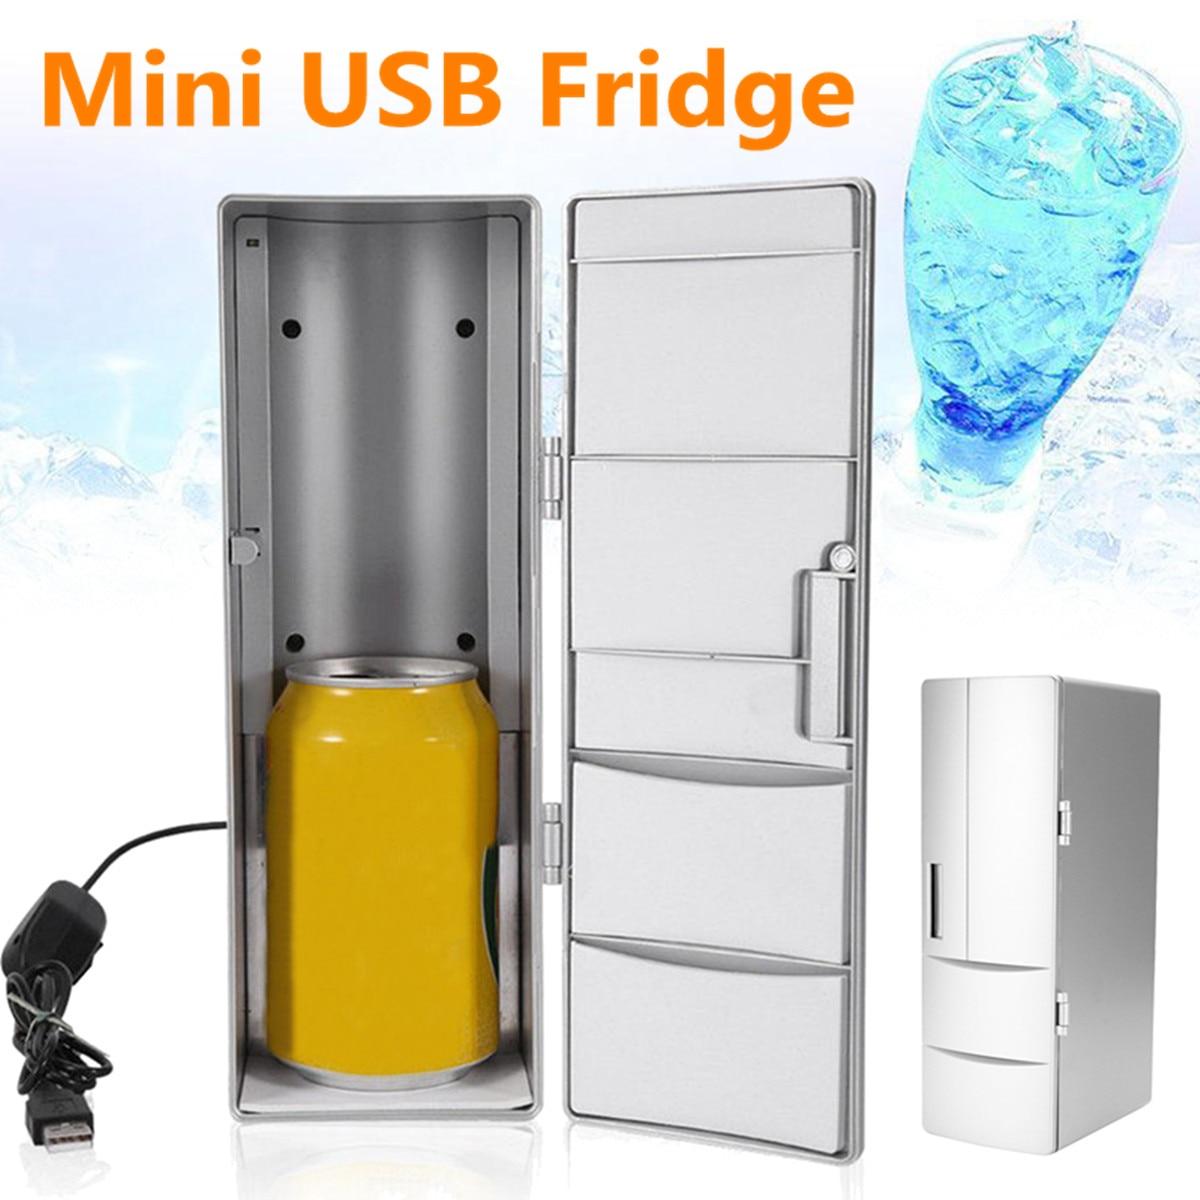 10W Mini USB Fridge Freezer Cans Drink Beer Cooler Warmer ABS Travel  Refrigerator Icebox Car Office Use Portable Refrigerator